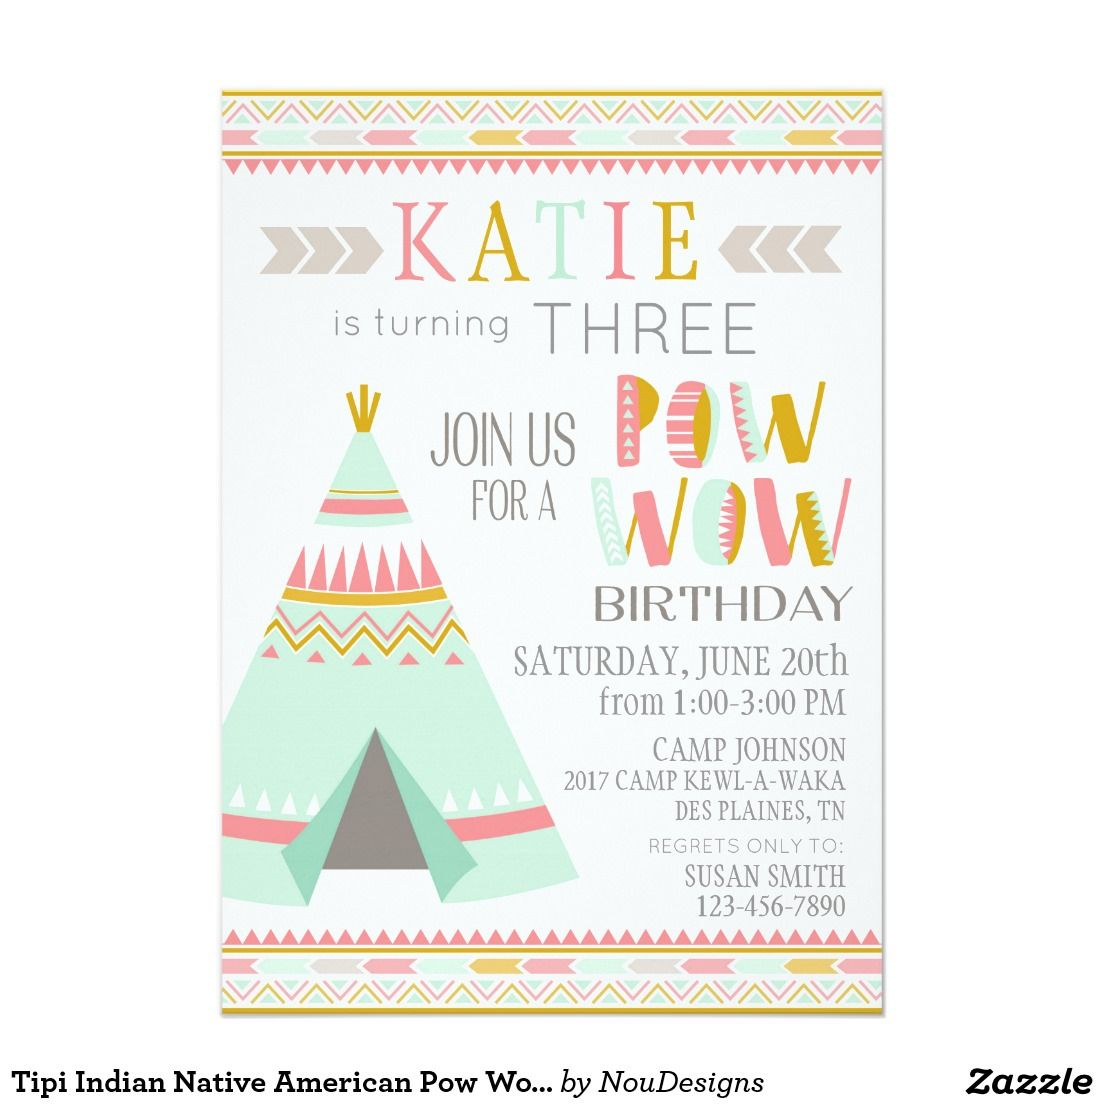 Tipi Native American Indian Pow Wow Birthday Invitation Pinterest